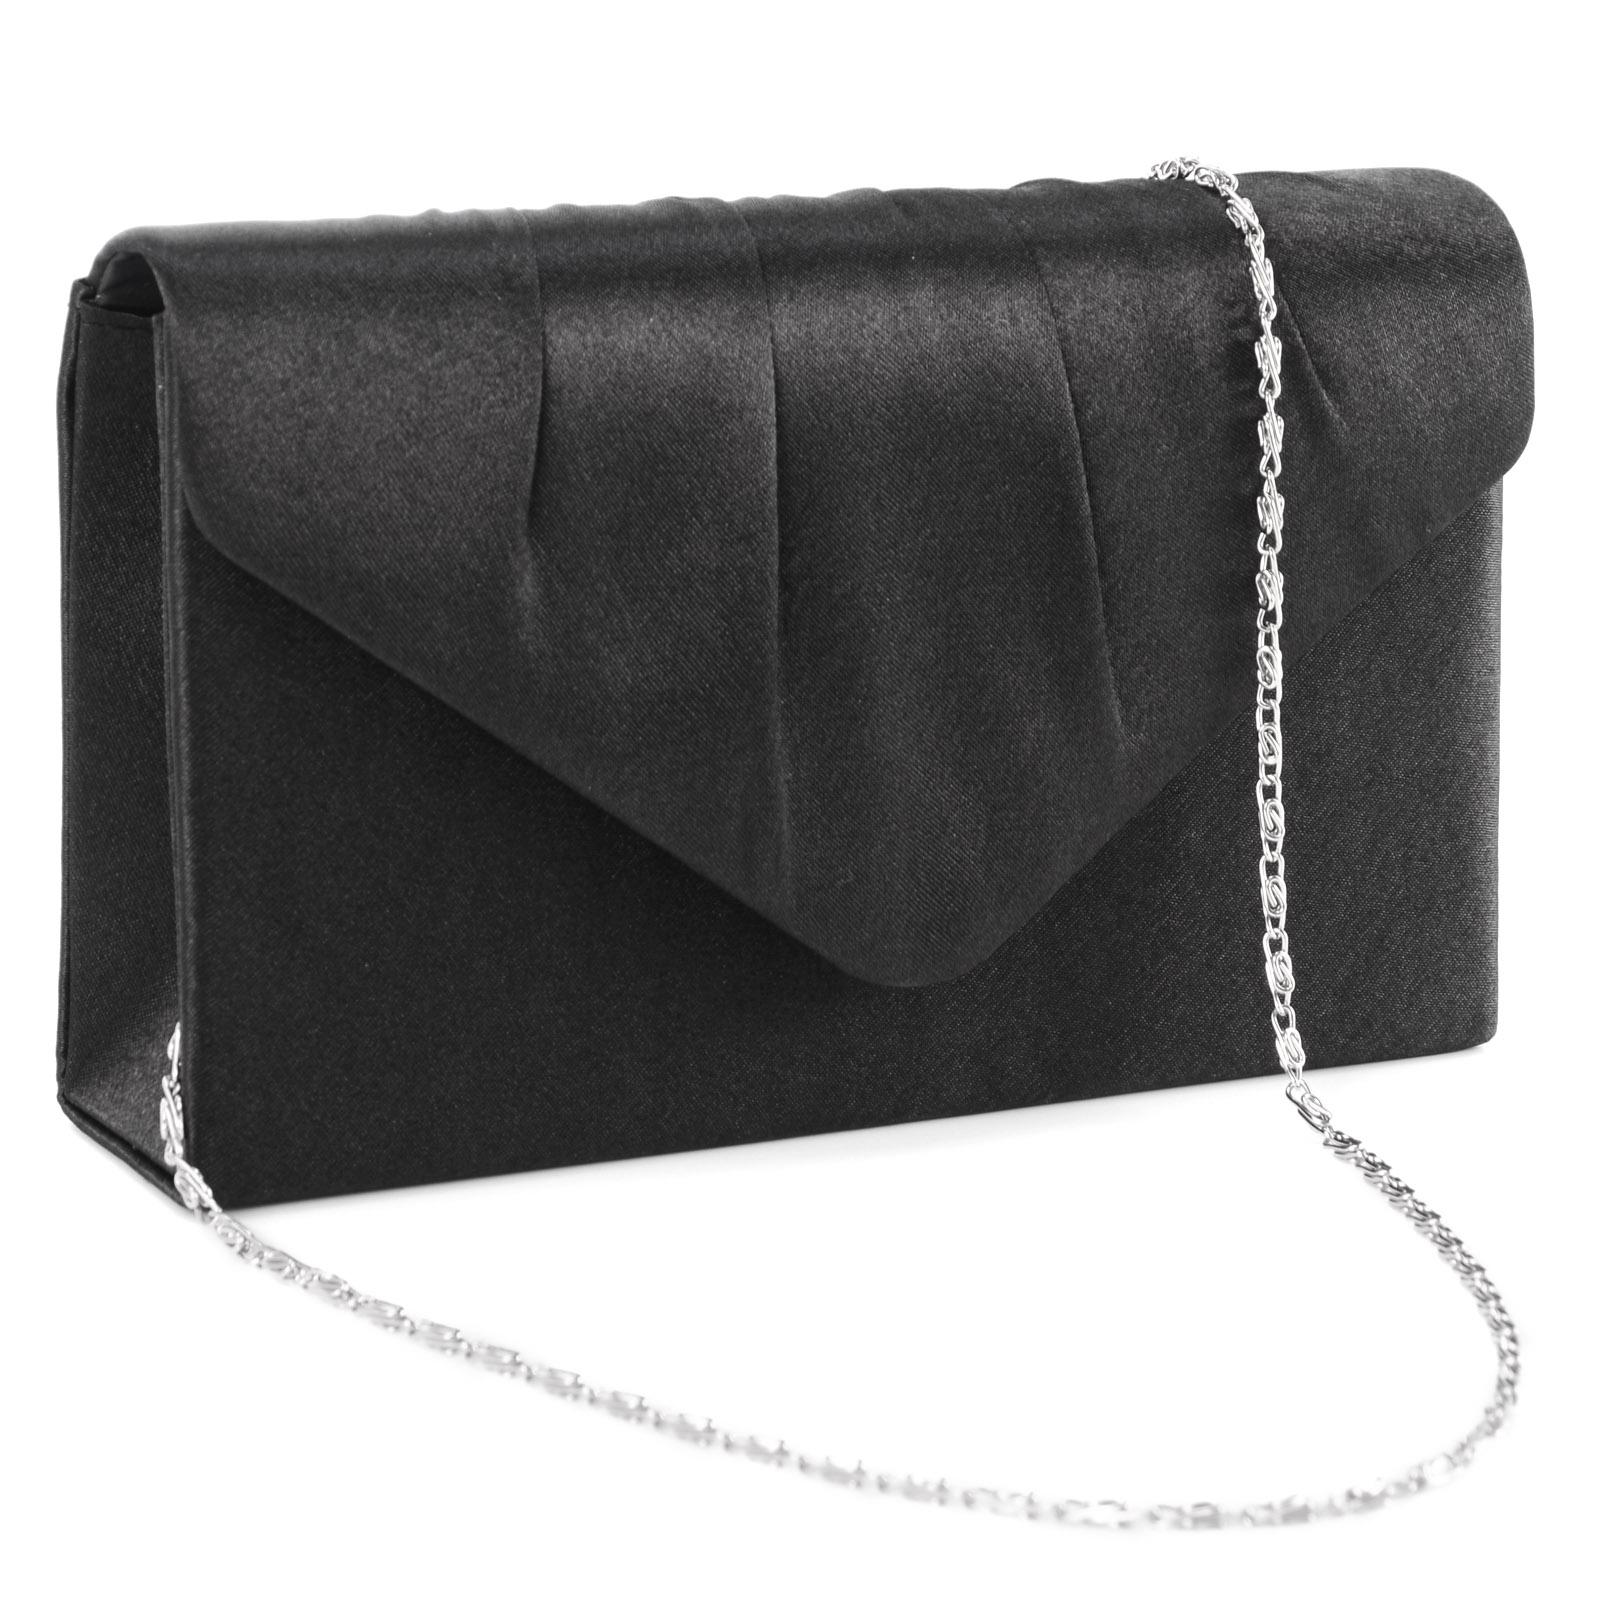 Ladies Satin Evening Clutch Bag Women Bag Purse Wedding Party Bridal Handbag | EBay